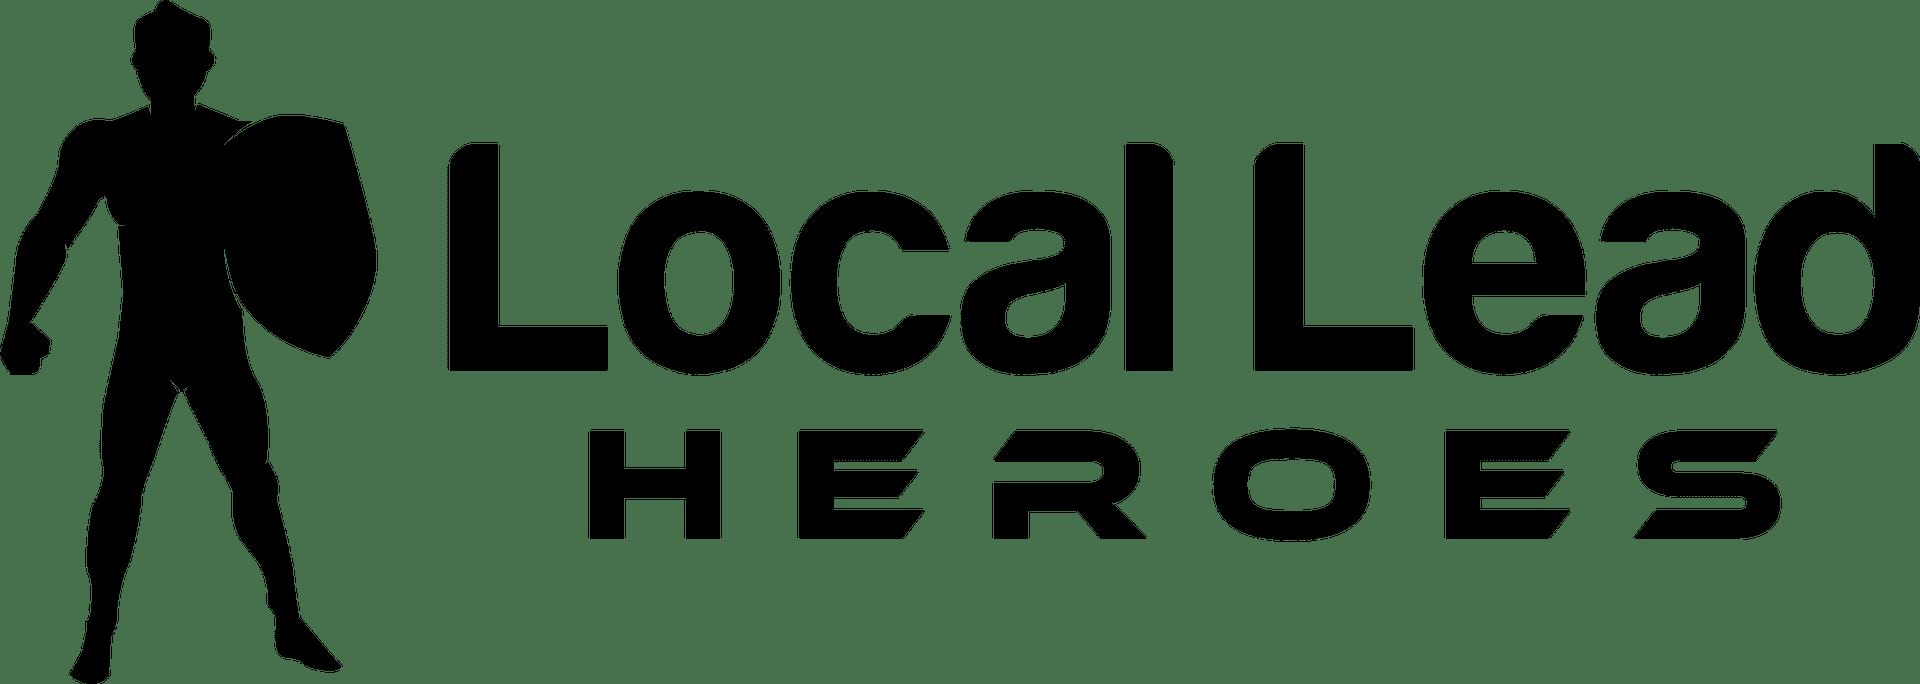 Winners in local advertising